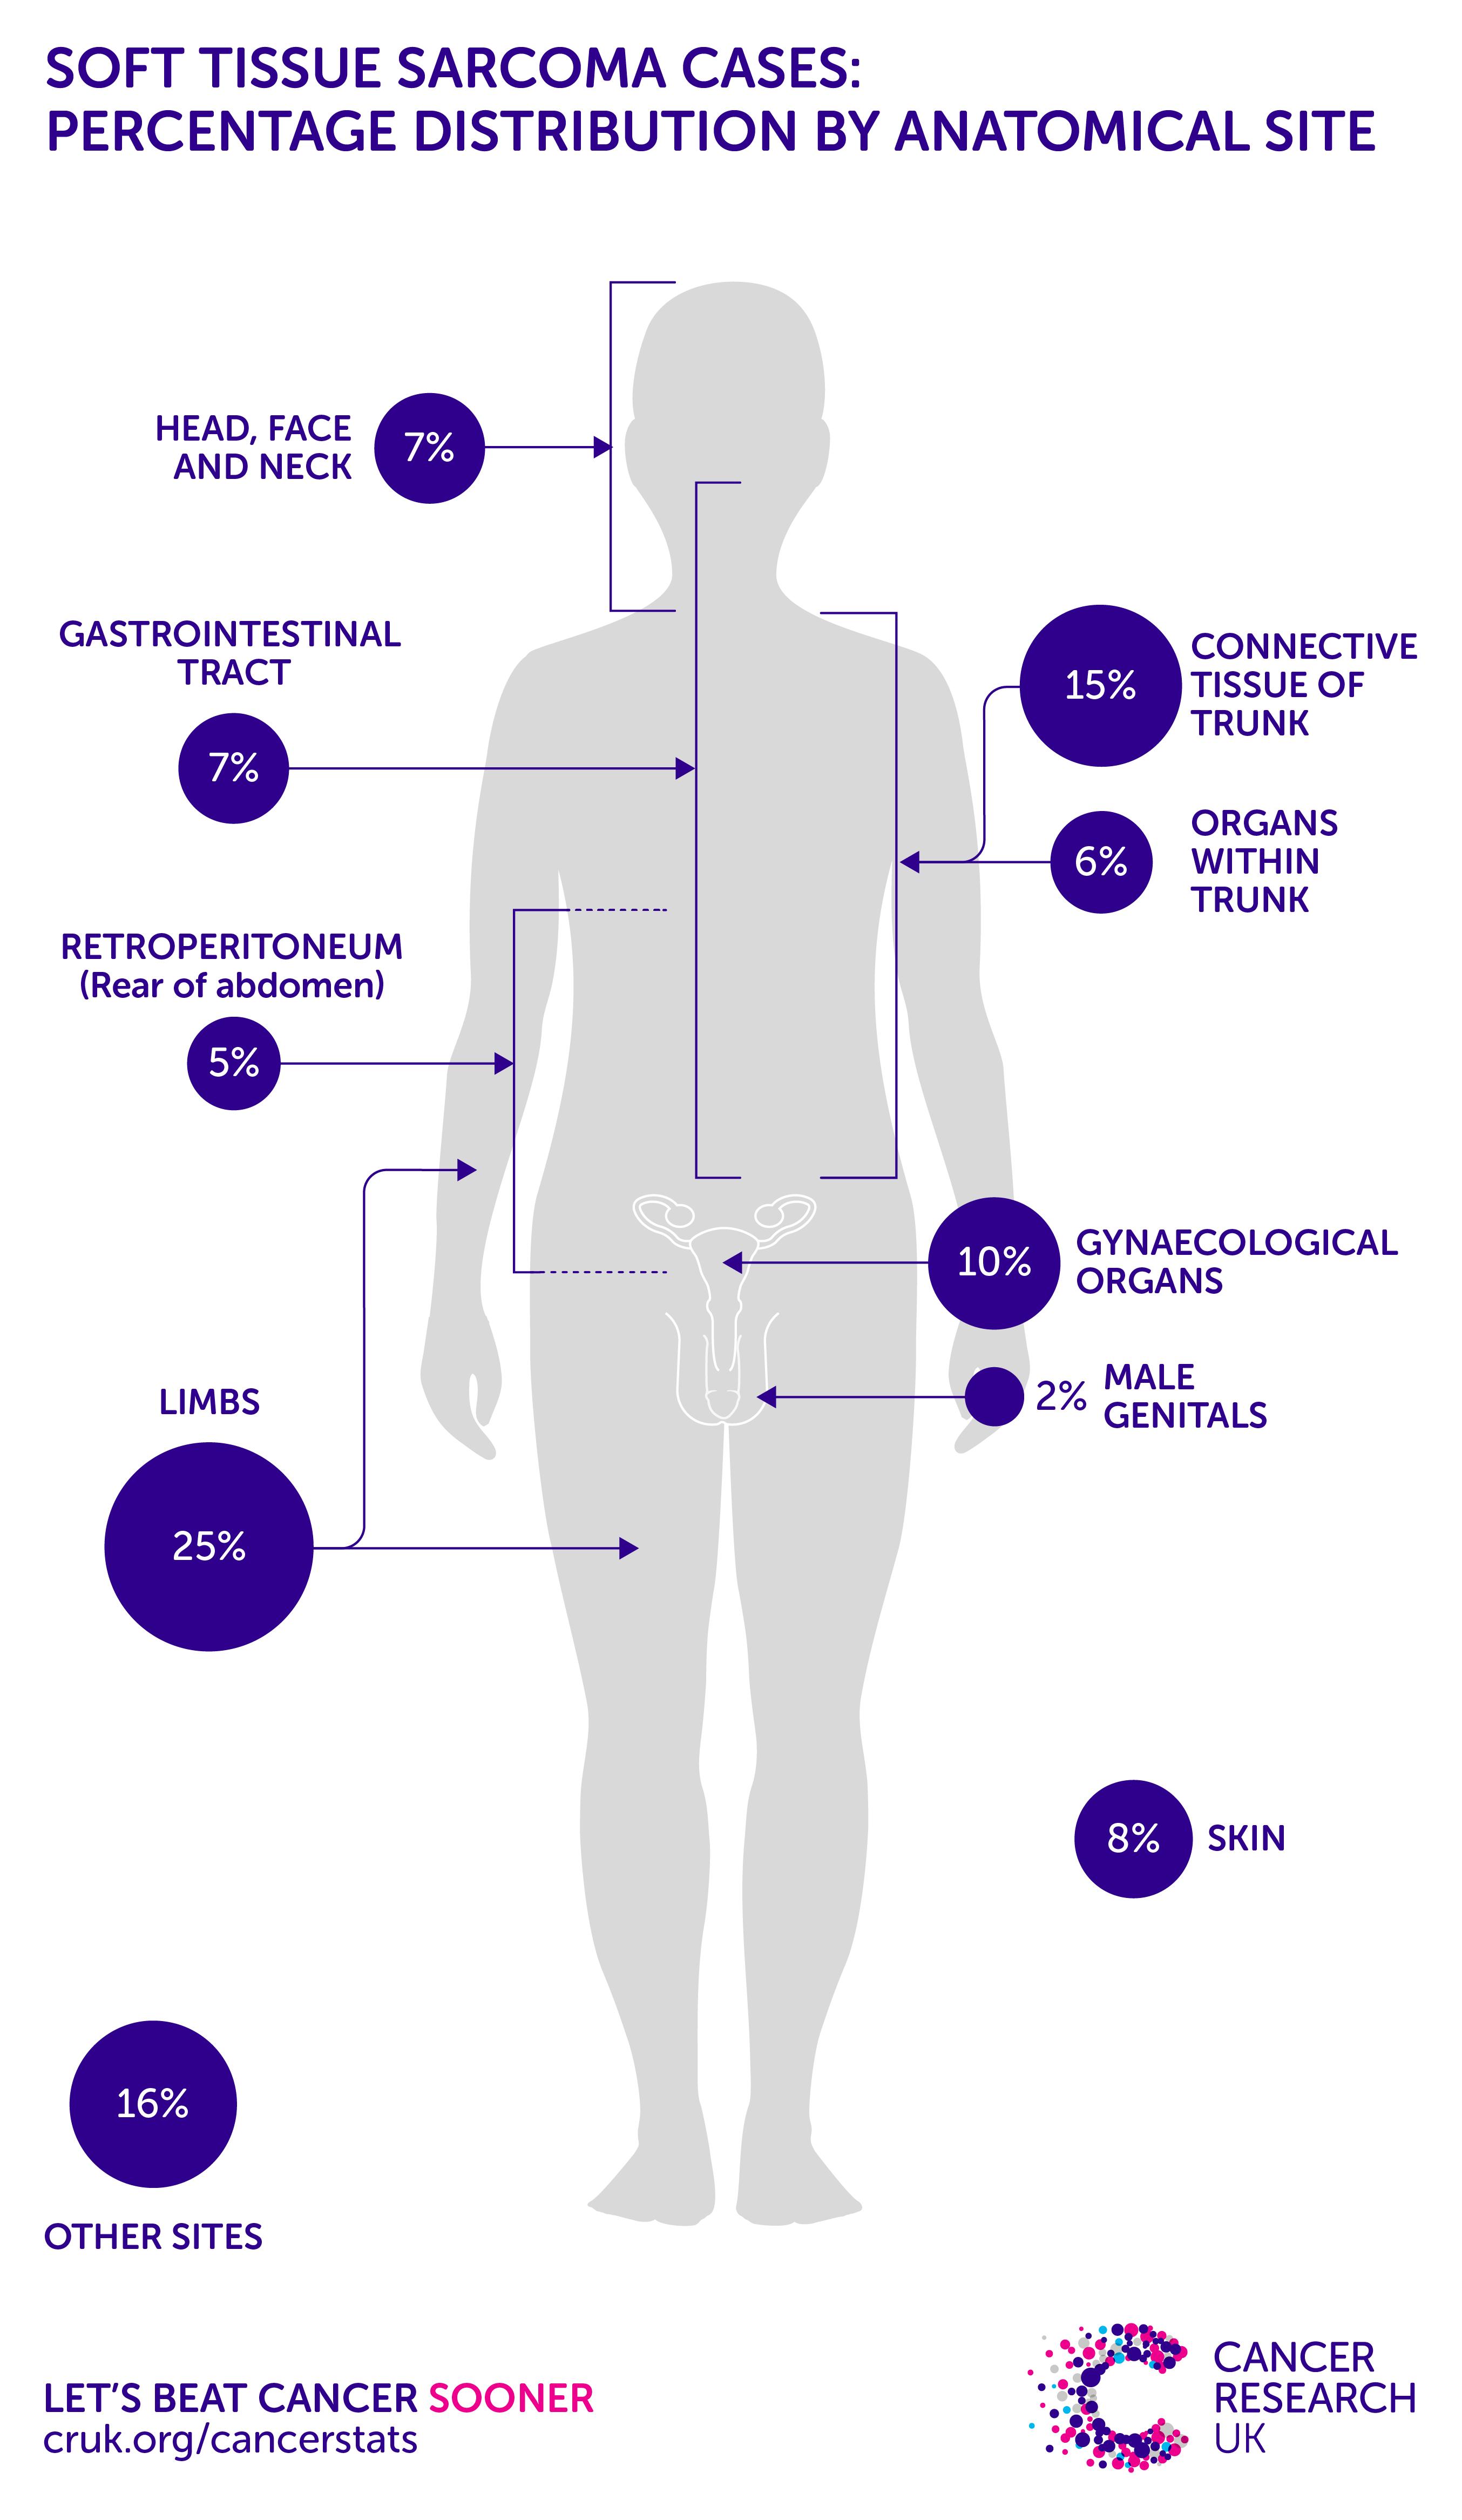 sarcoma cancer research uk